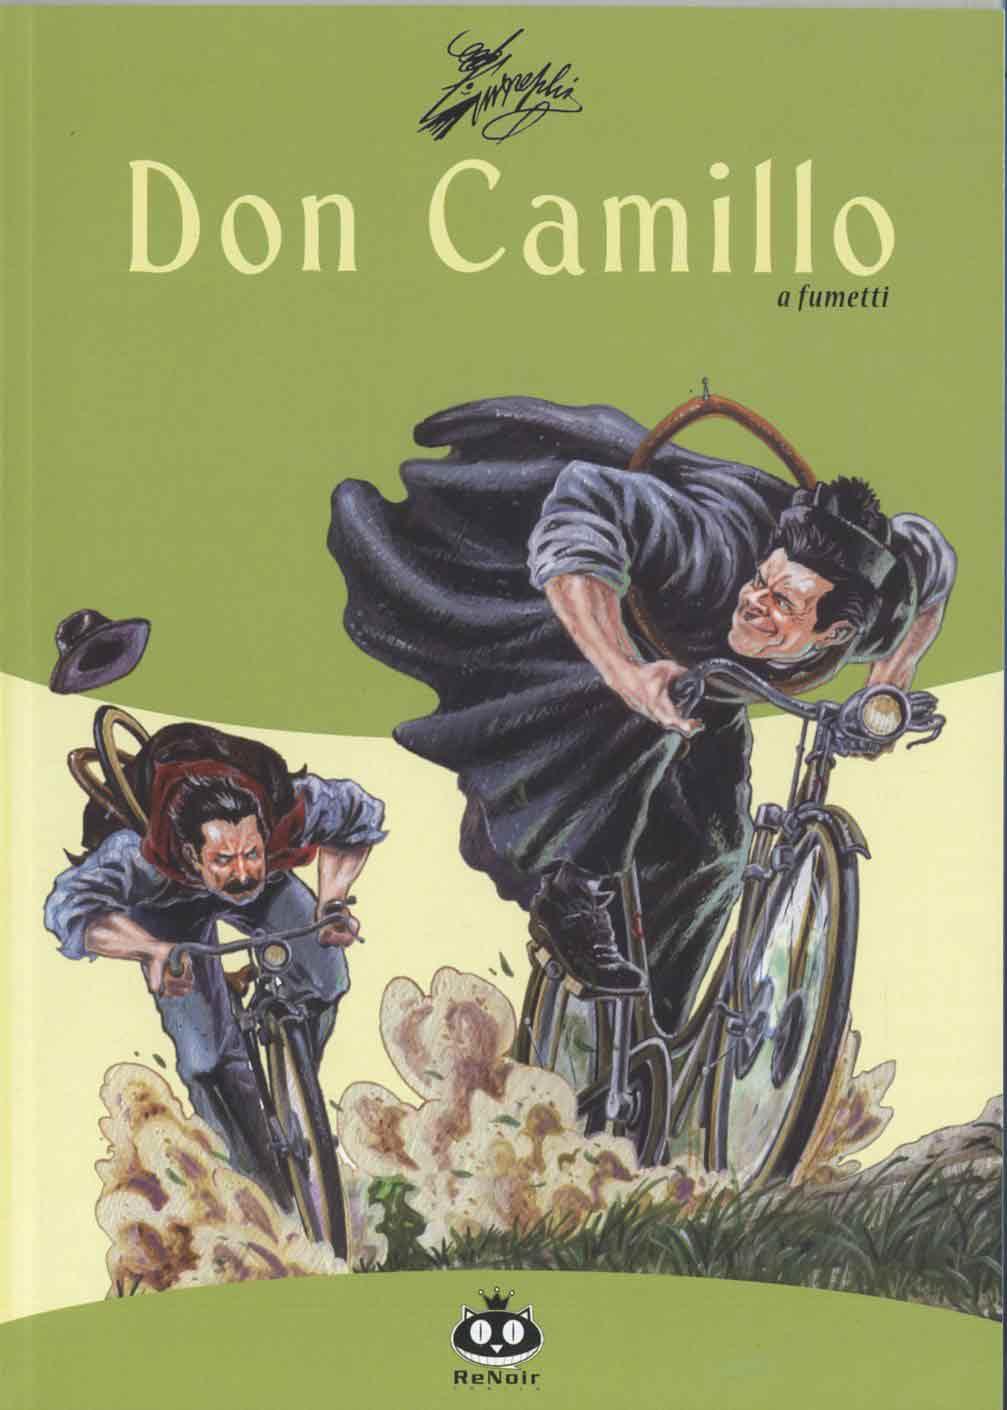 Don Camillo Fumetti RENOIR